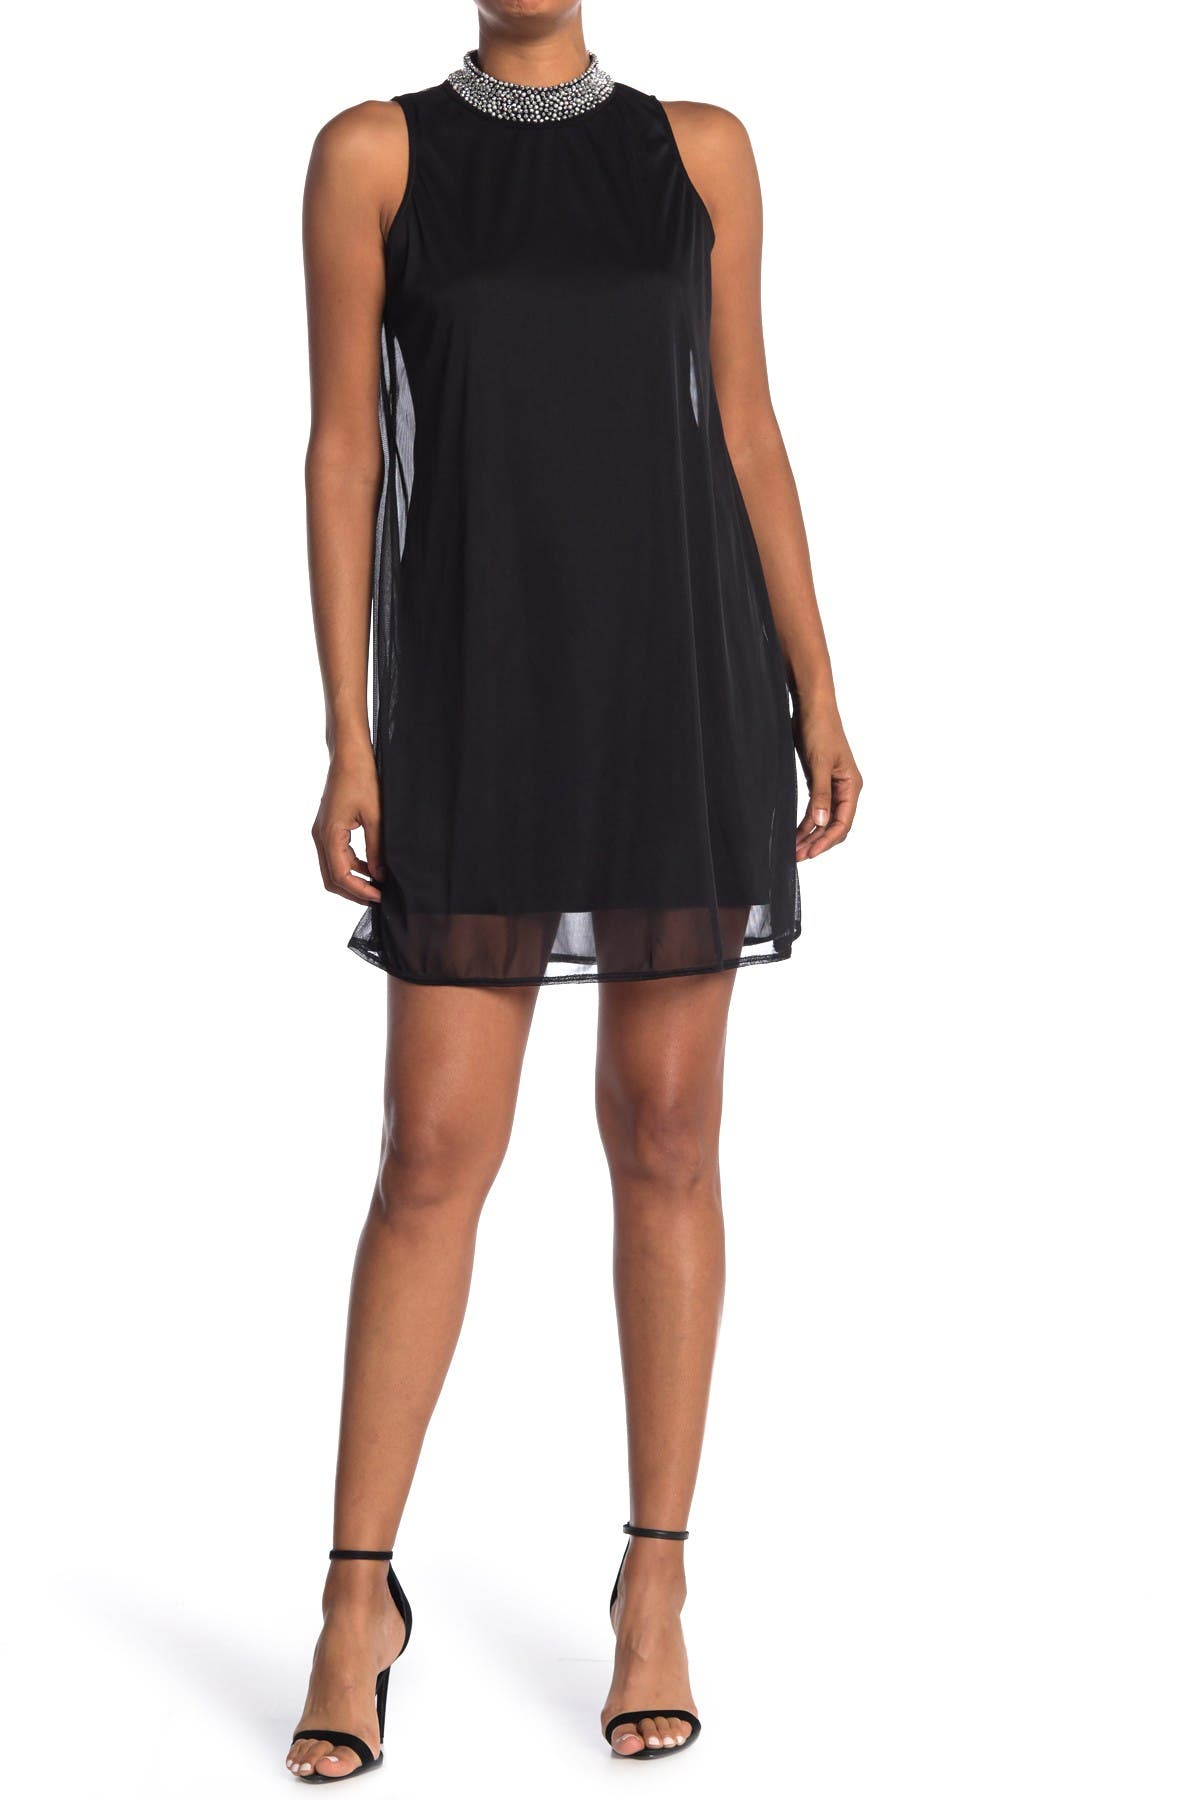 Image of TASH + SOPHIE Beaded Sleeveless A-Line Dress